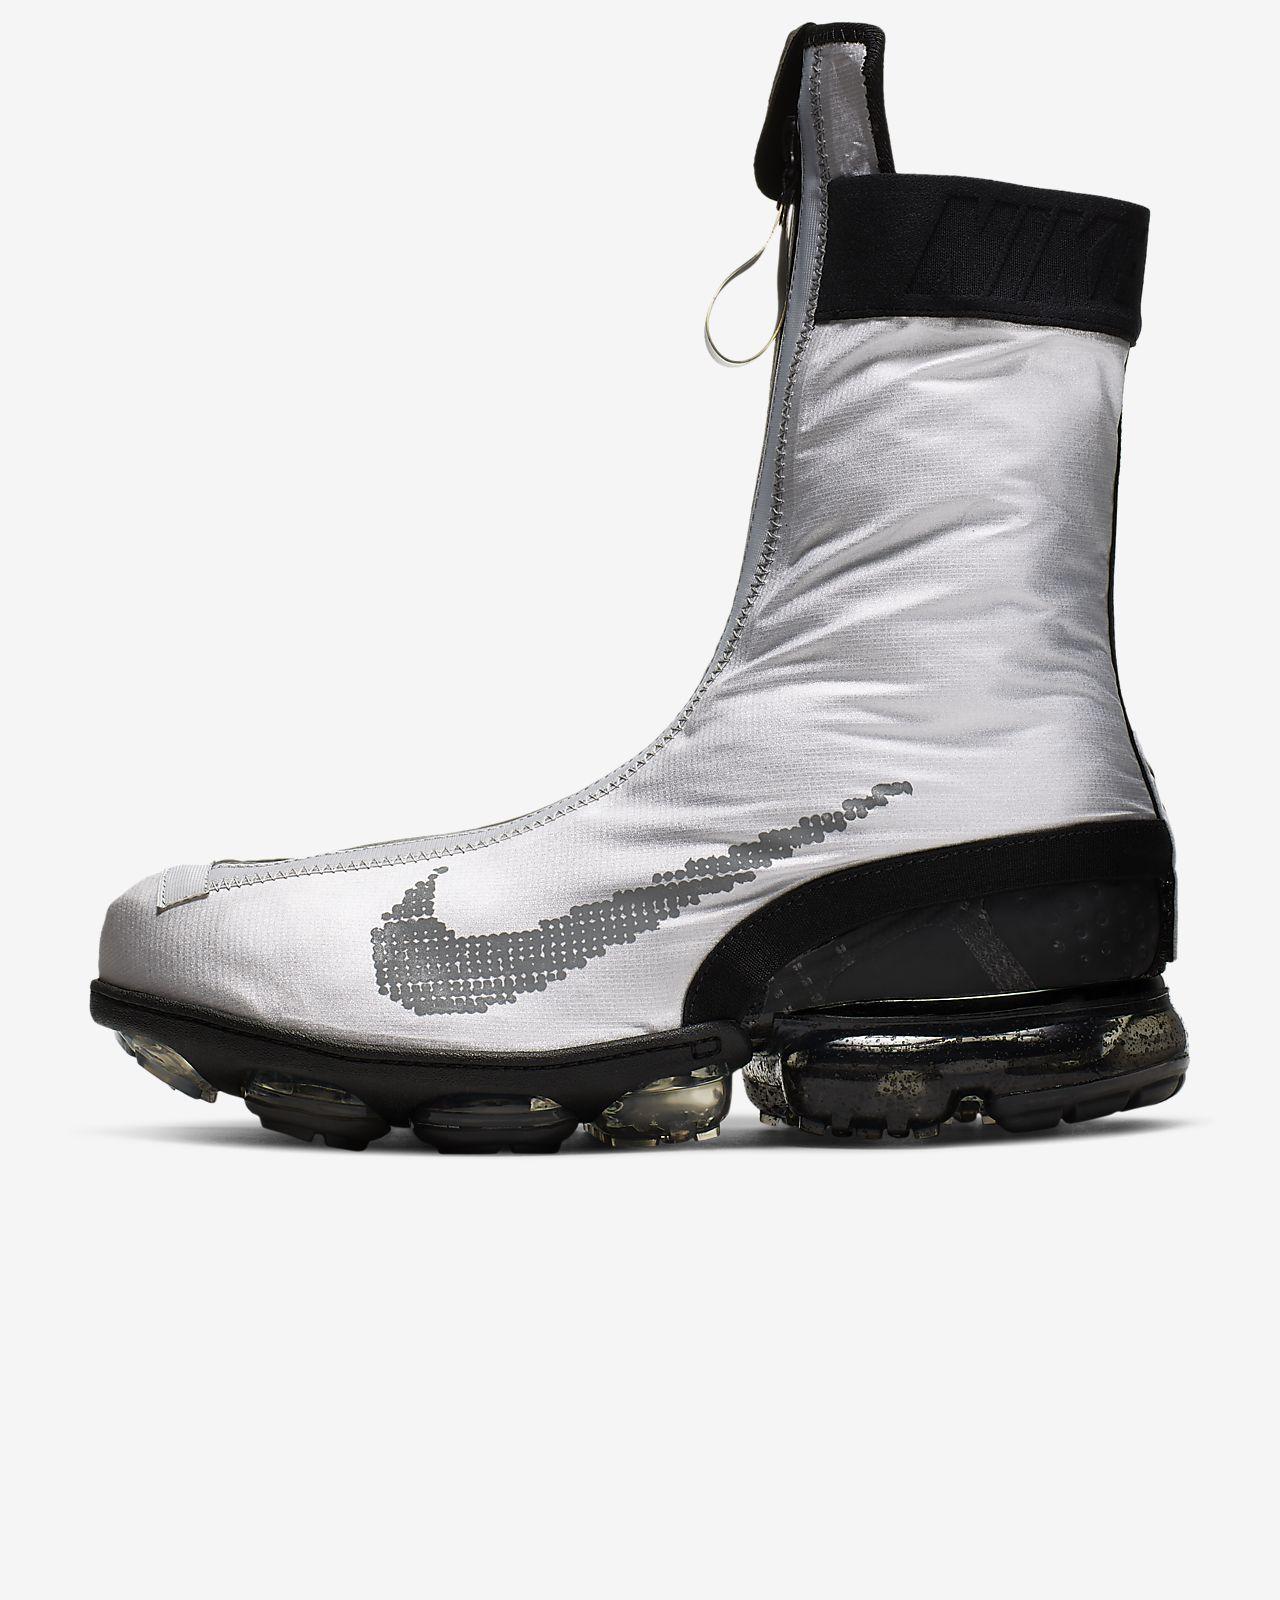 Vapormax Gaiter Flyknit Ispa Chaussure Nike Air tQshrd